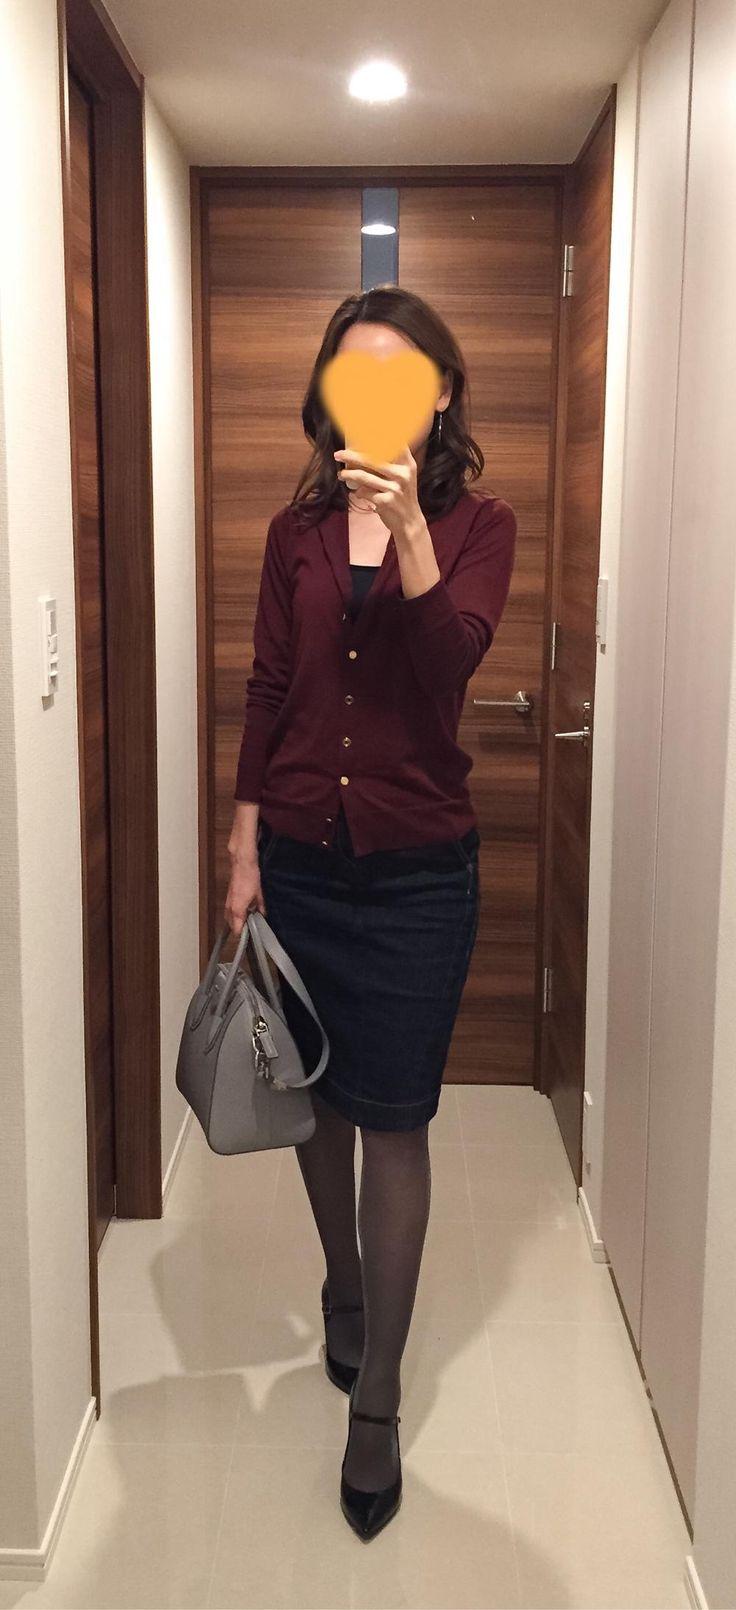 Burgundy cardigan: Deuxieme Classe, Denim skirt: BIANCA EPOCA, Grey bag: GIVENCHY, Pumps: Fabio Rusconi